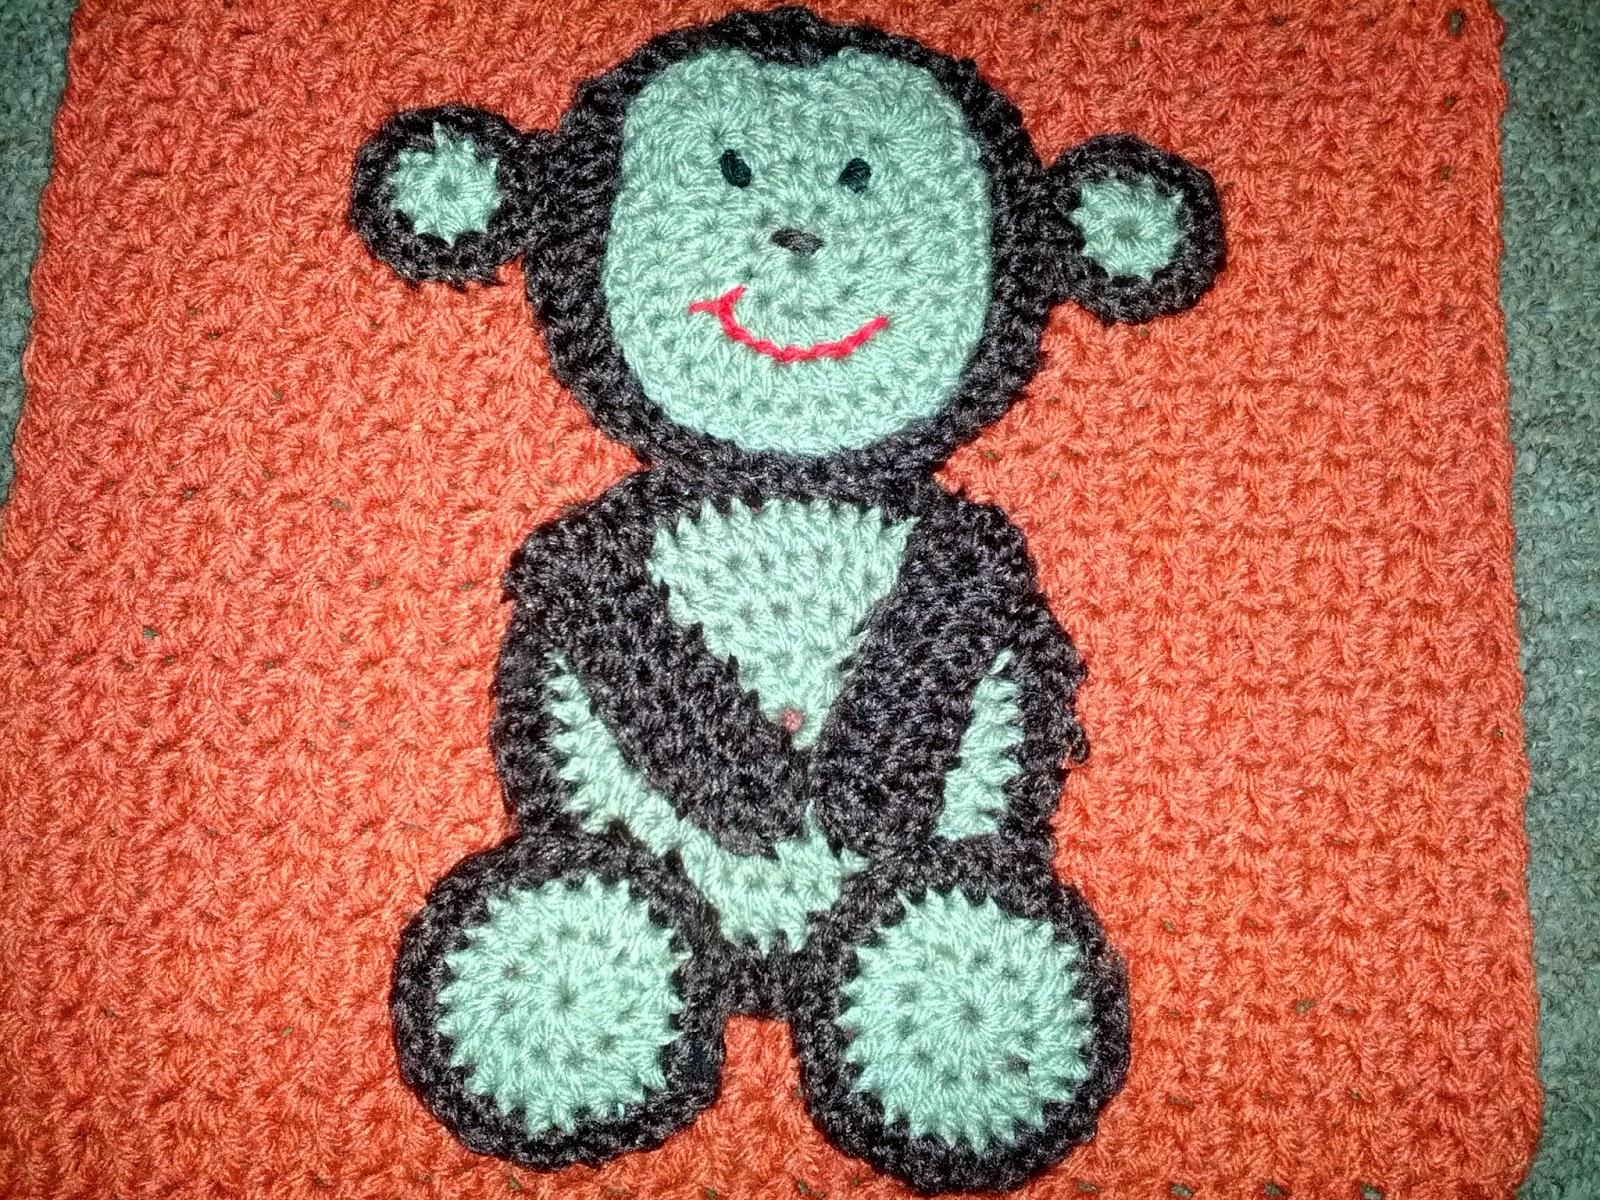 Free crochet pattern for monkey blanket dancox for blooming lovely january 2014 free crochet pattern for monkey blanket bankloansurffo Images